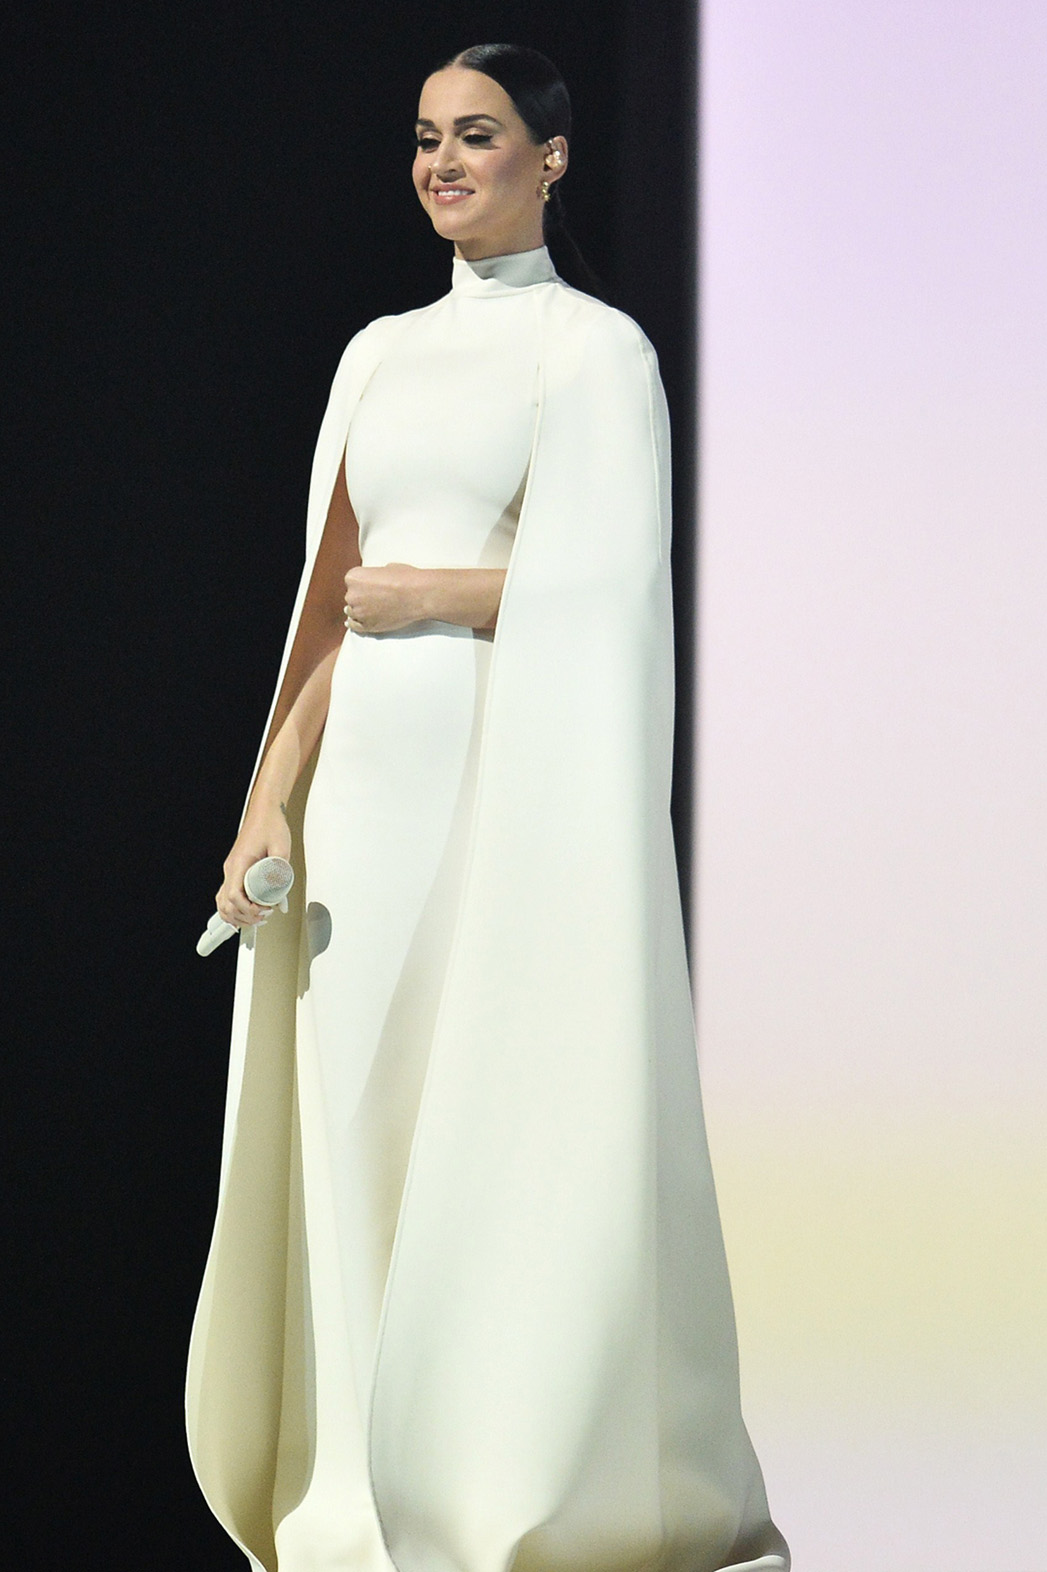 Katy Perry Grammy Performance - P 2015